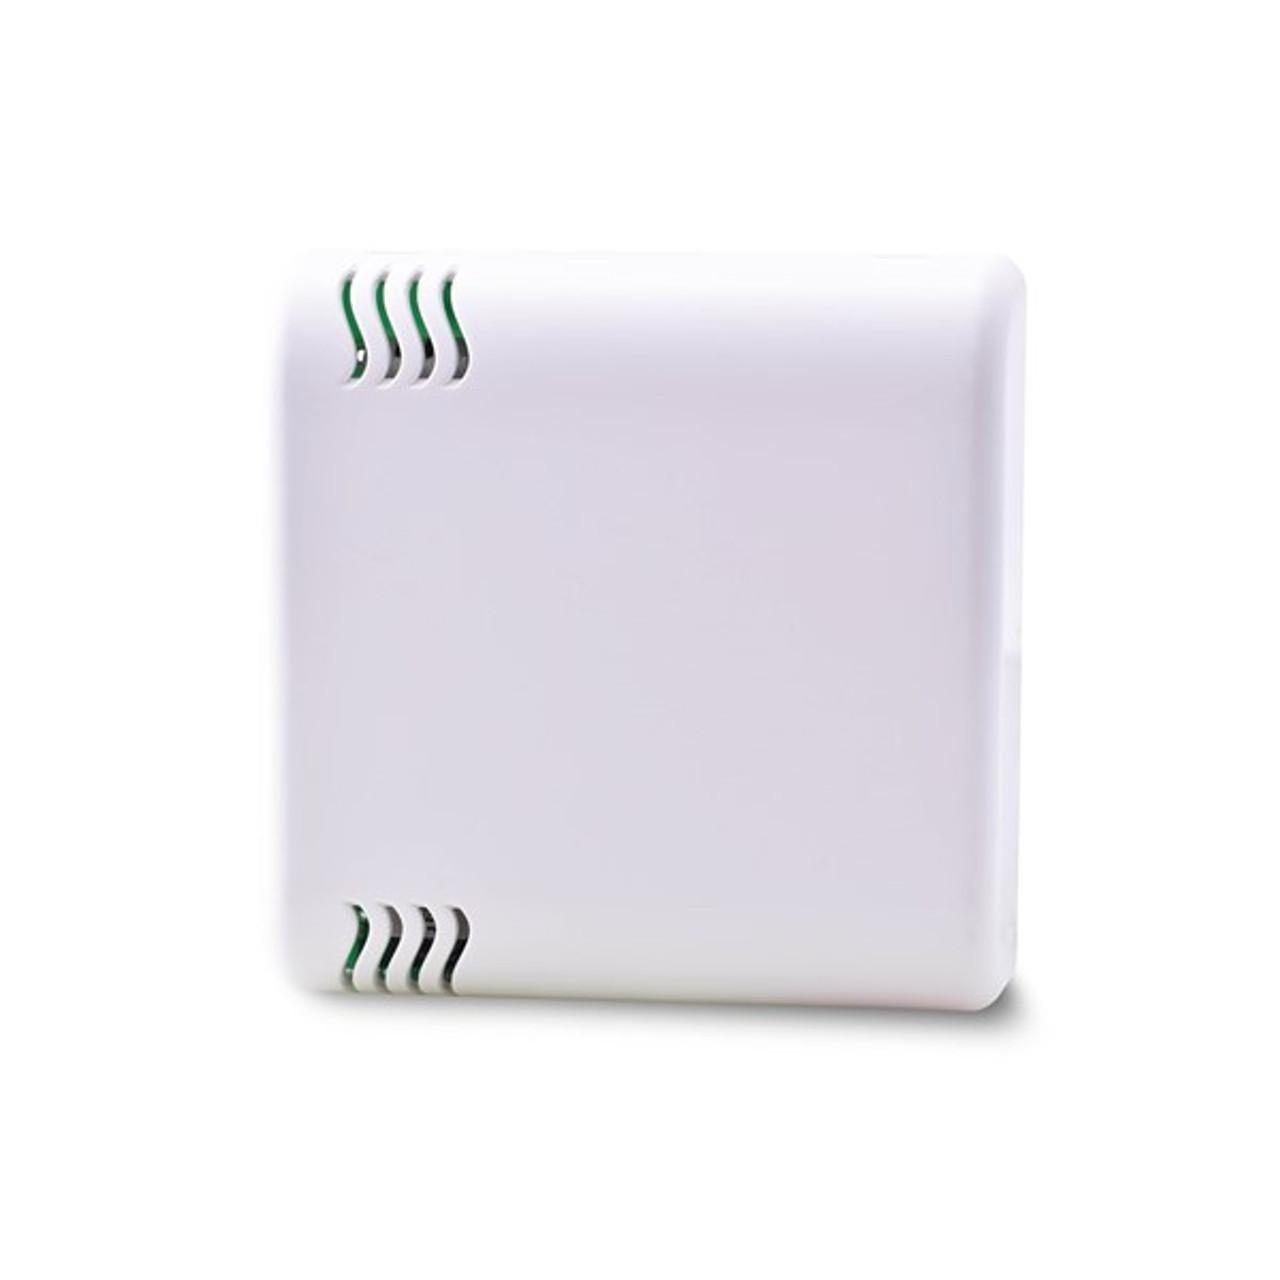 CMa11w Indoor temperature/humidity sensor Wireless M-Bus